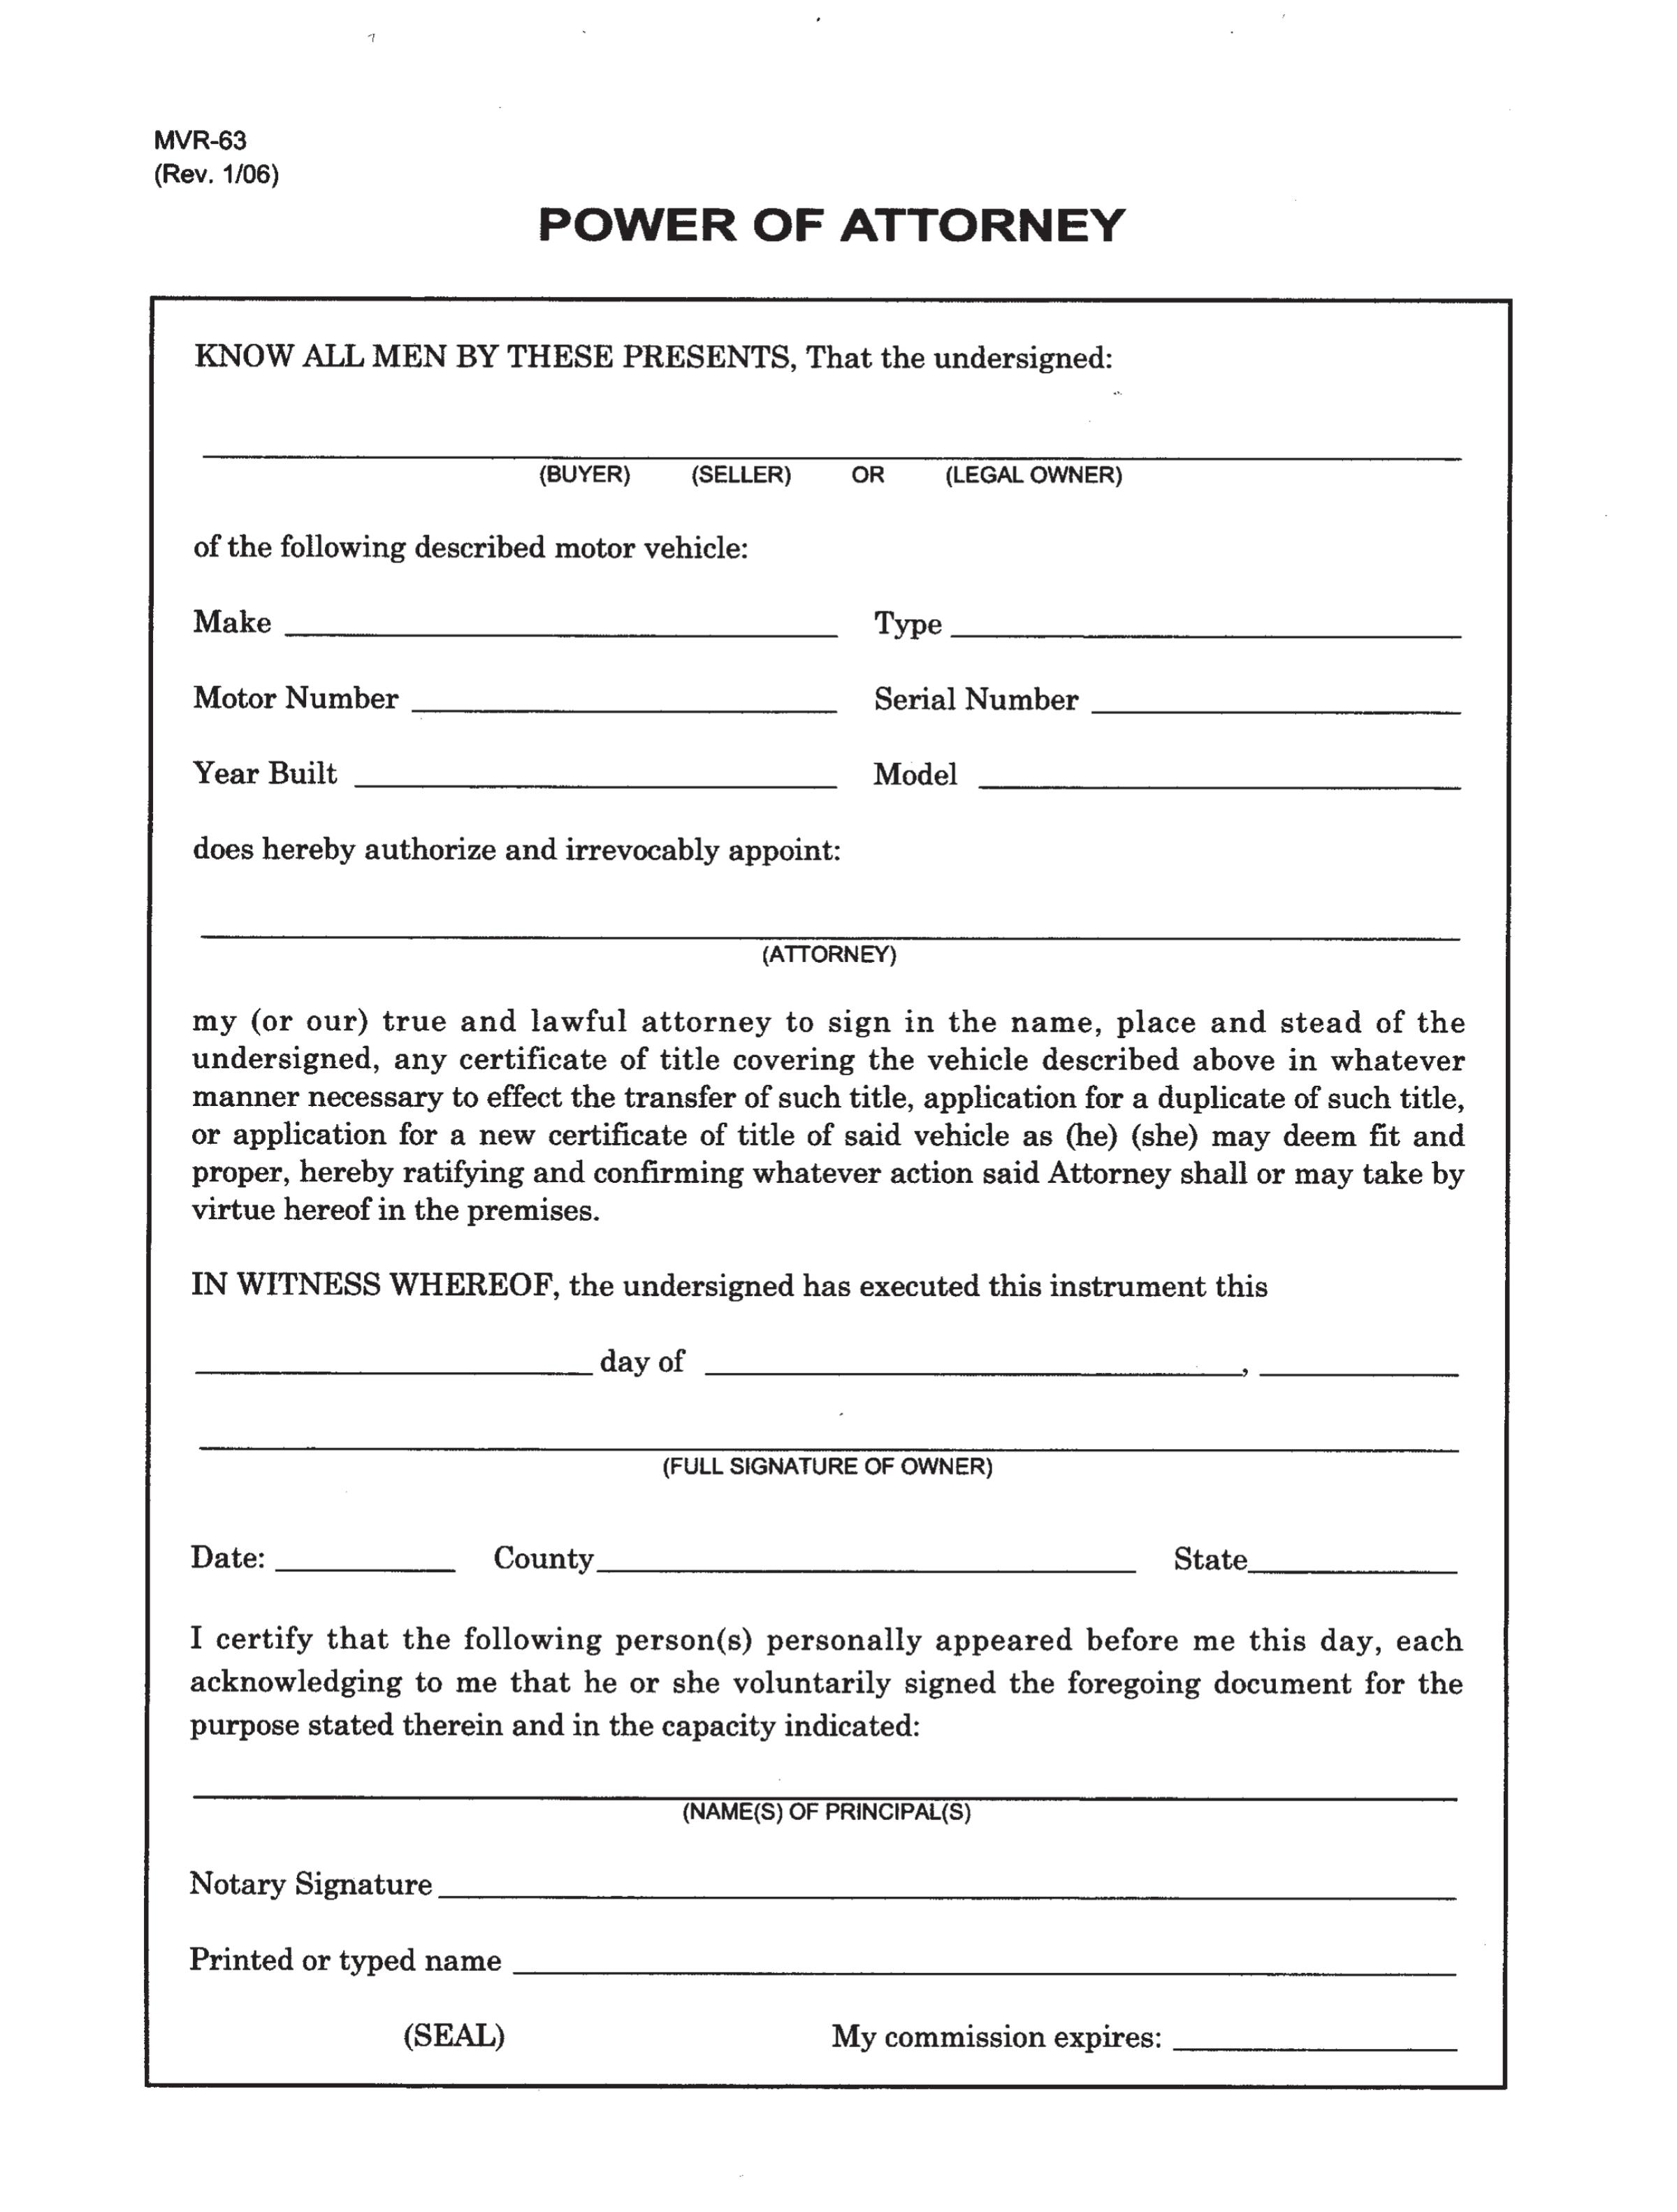 North Carolina Motor Vehicle Power Of Attorney Form MVR